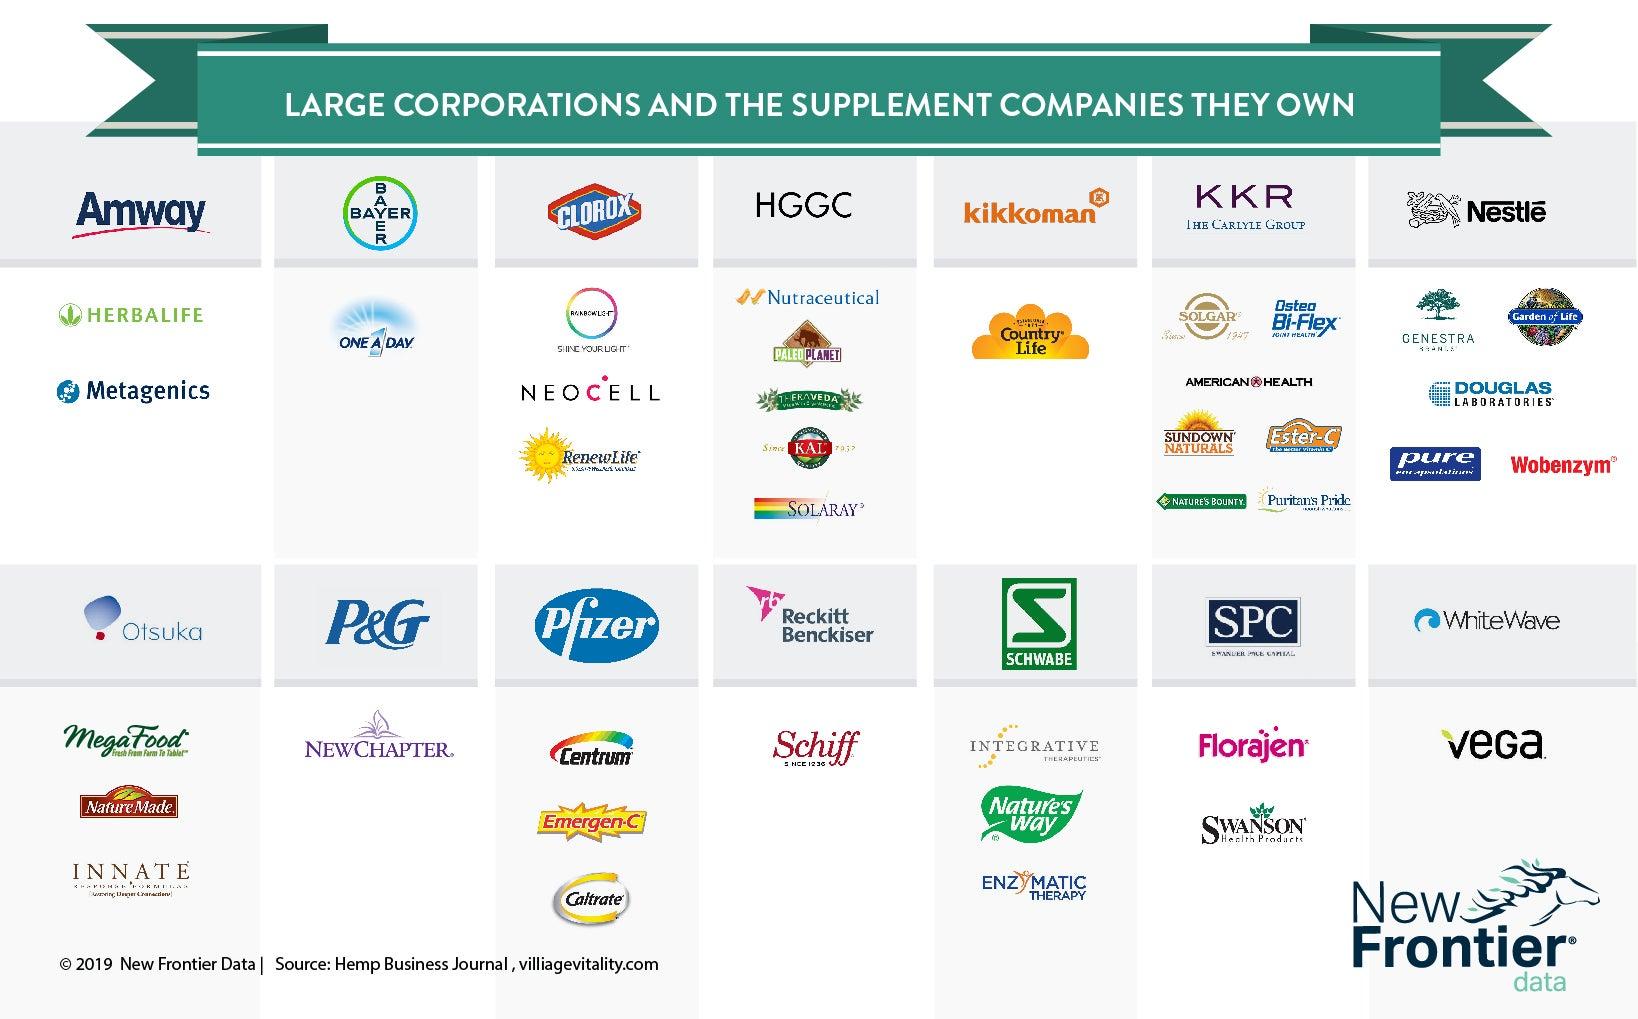 5-8-19-supplement-companies.jpg